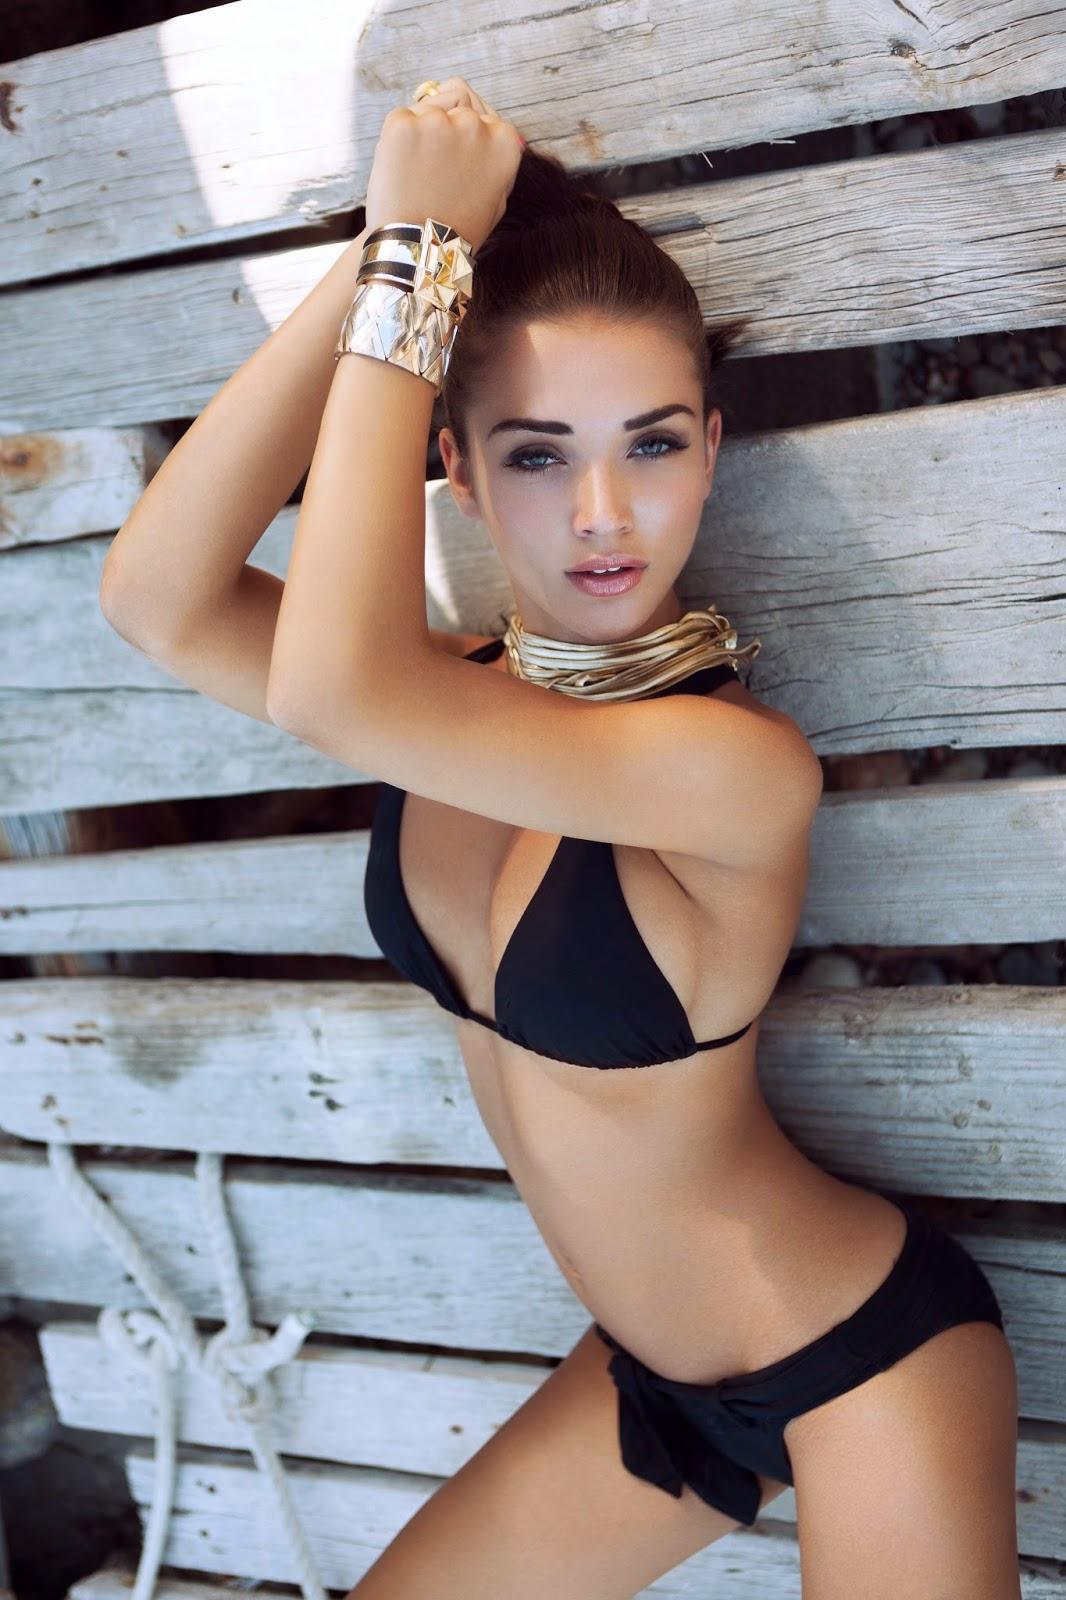 Hot sexy photo gallery